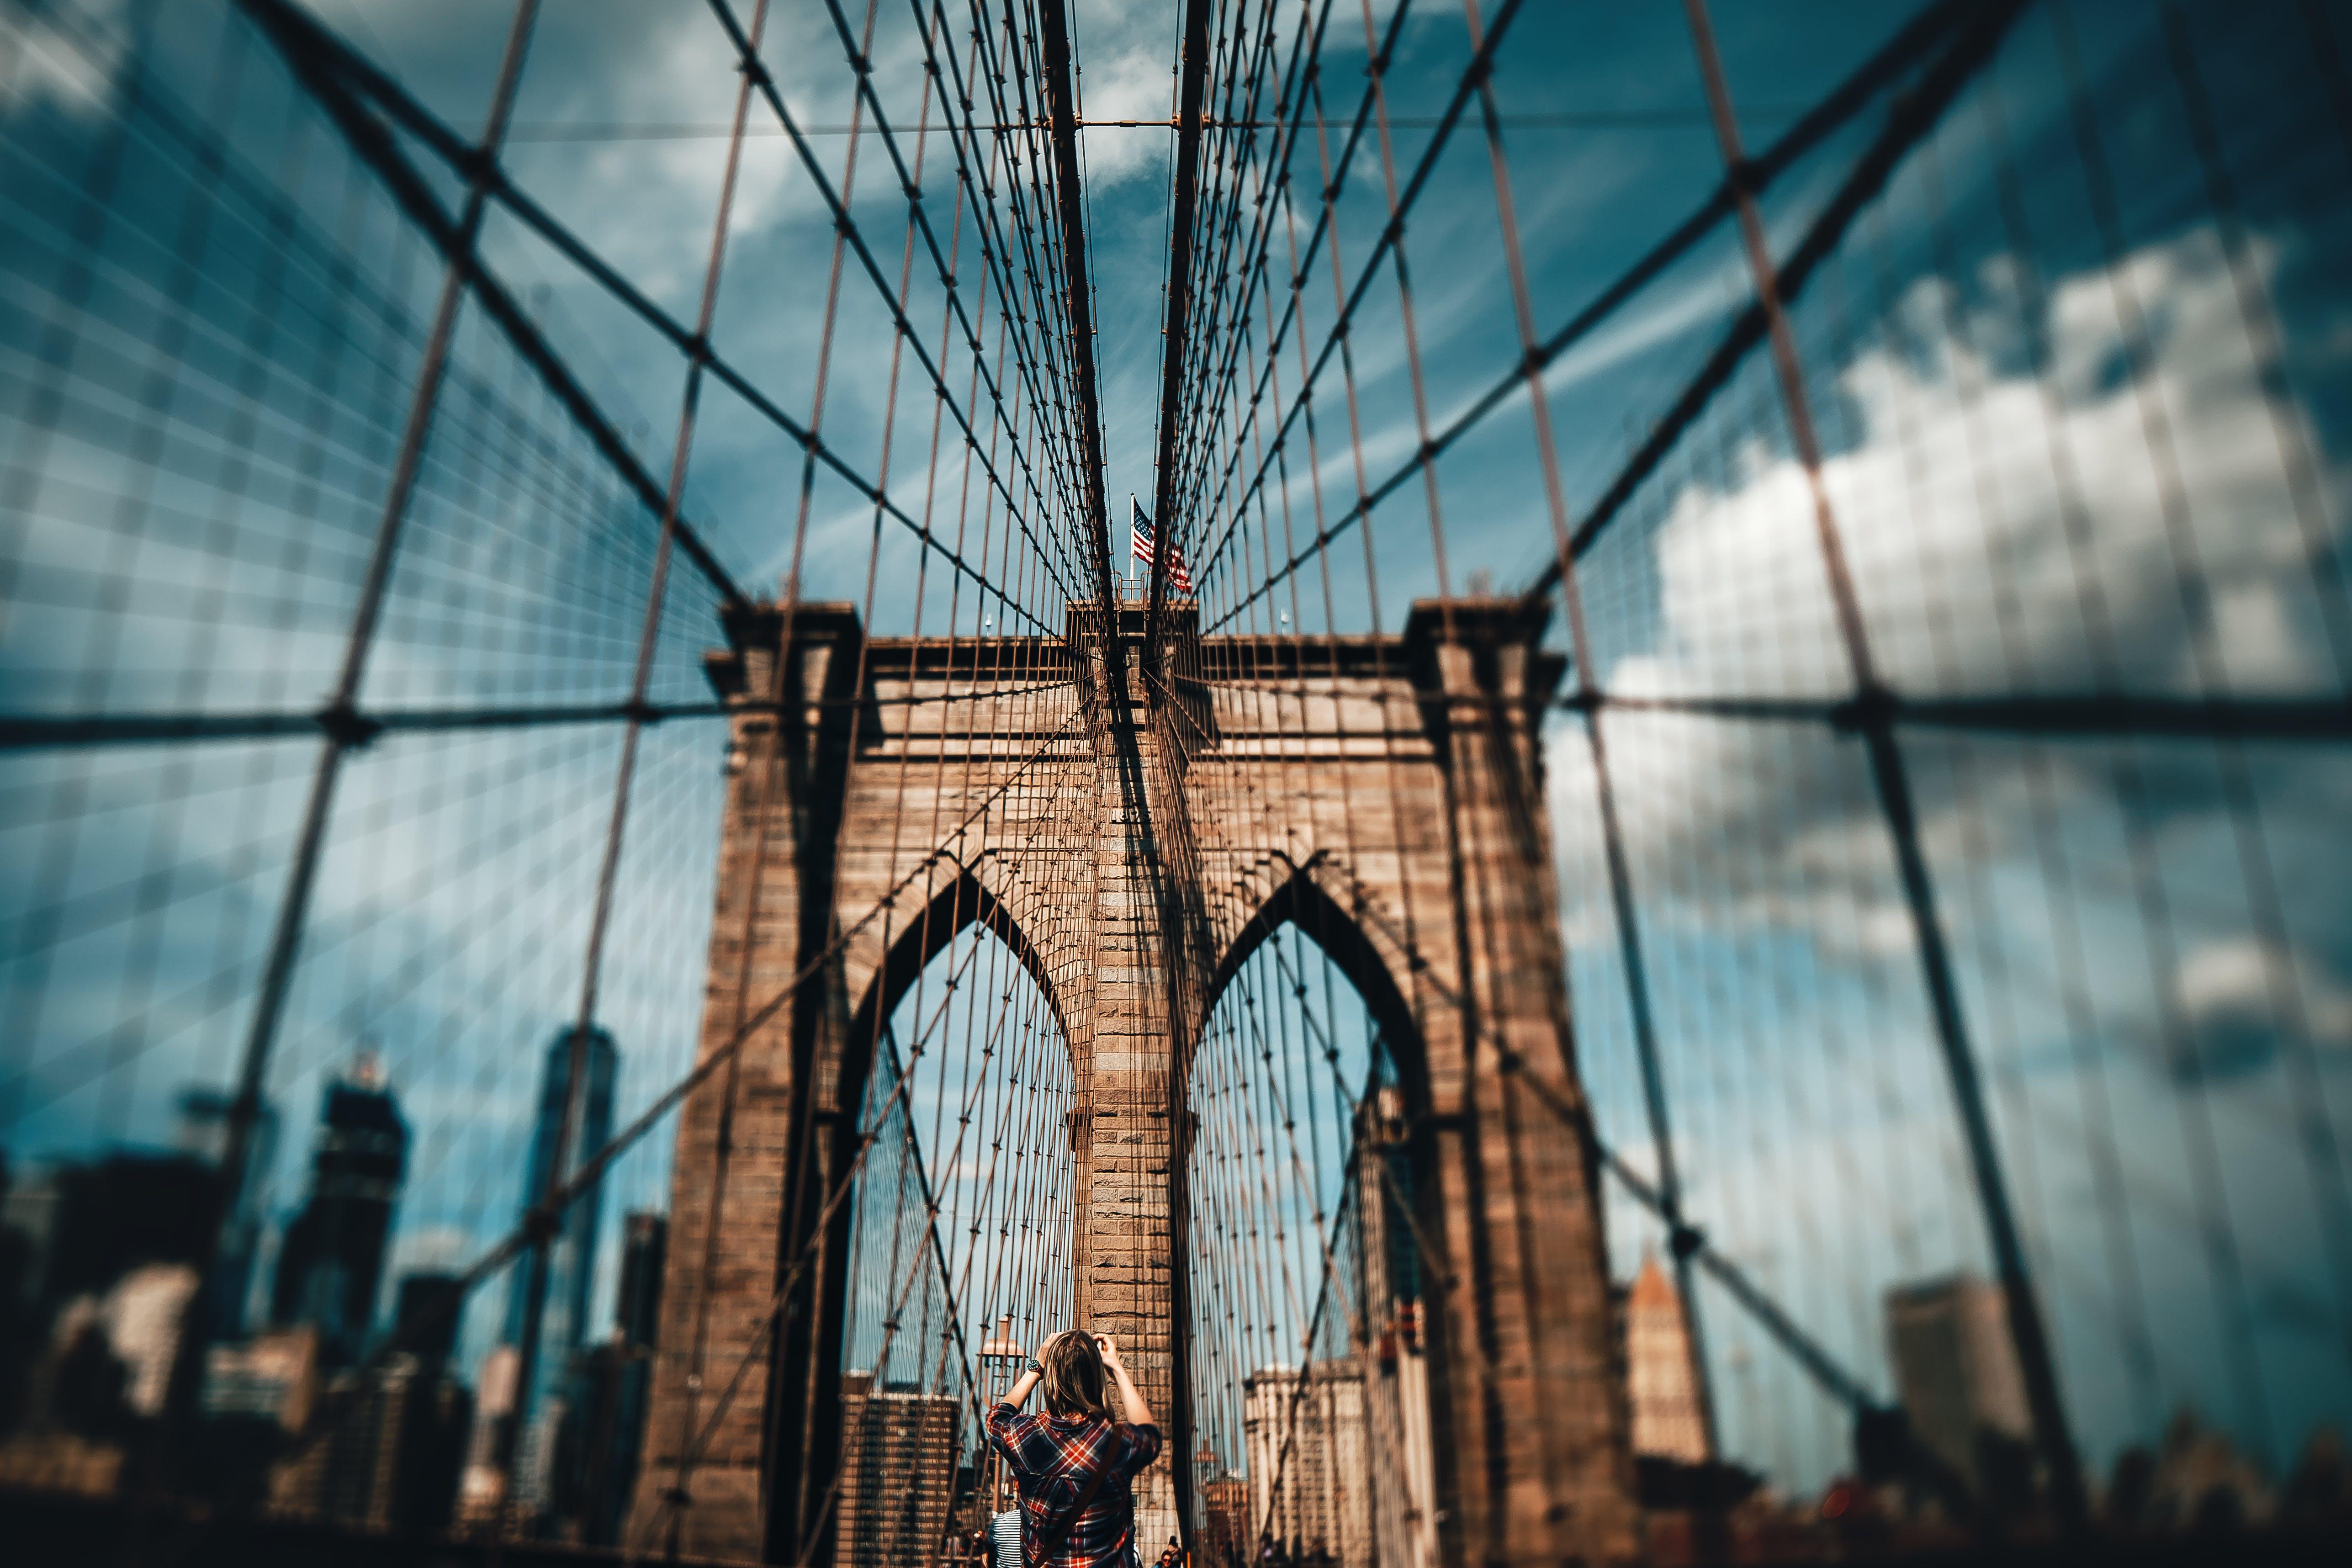 Blur Photo of Brooklyn Bridge at Daytime